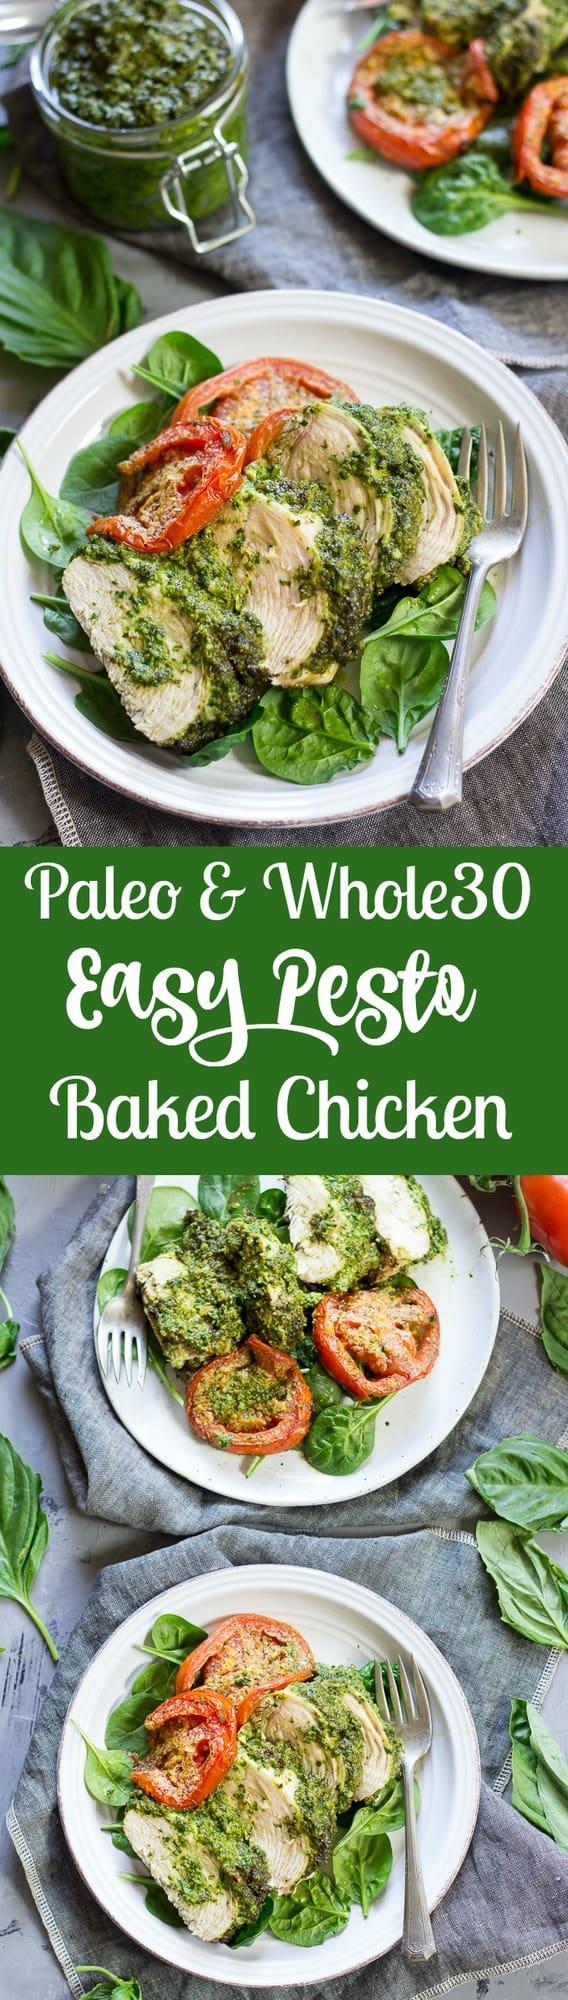 paleo-whole30-easy-pesto-baked-chicken